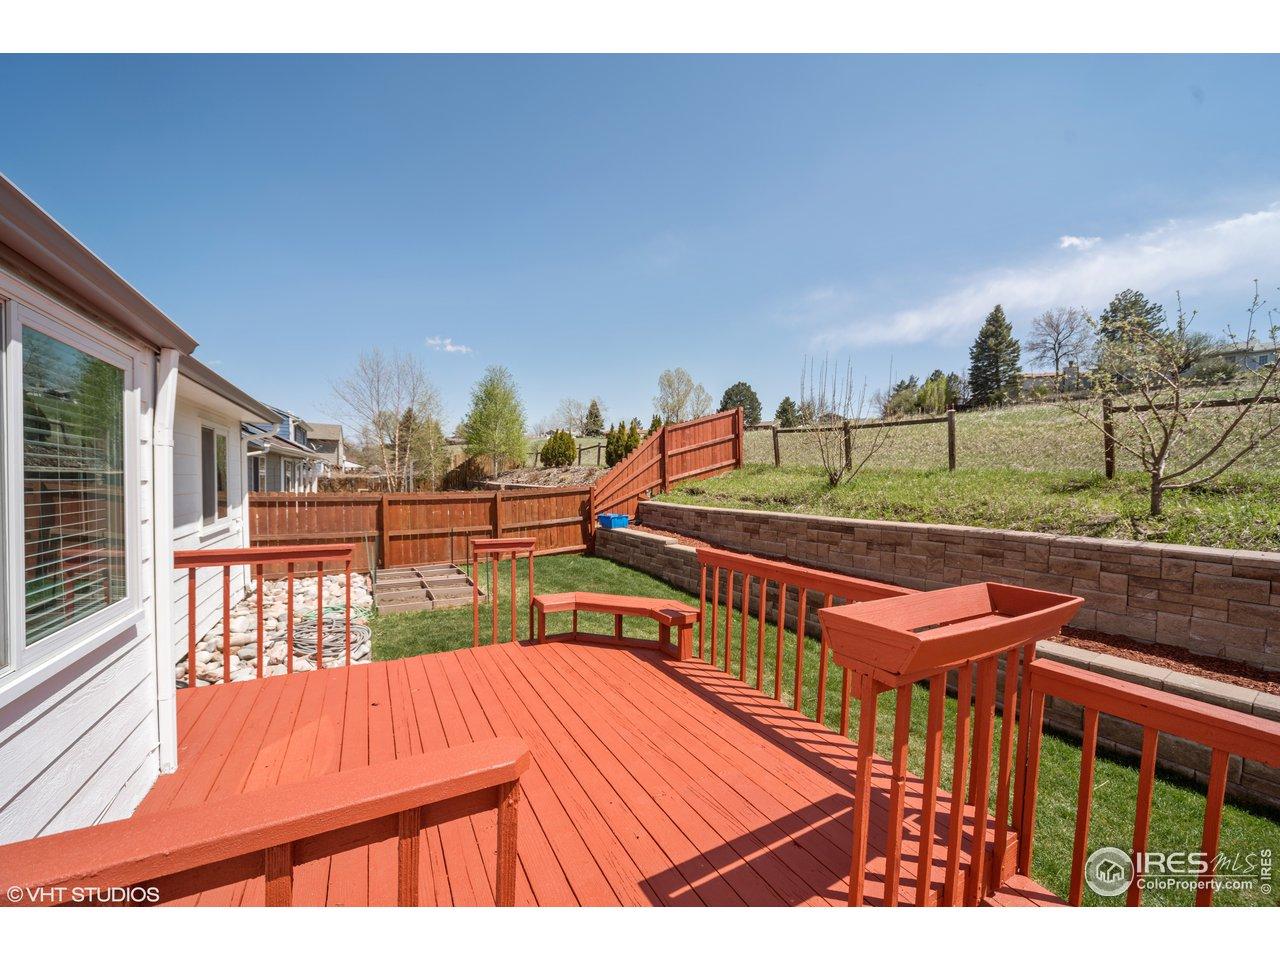 Rear deck overlooking open space.No rear neighbors